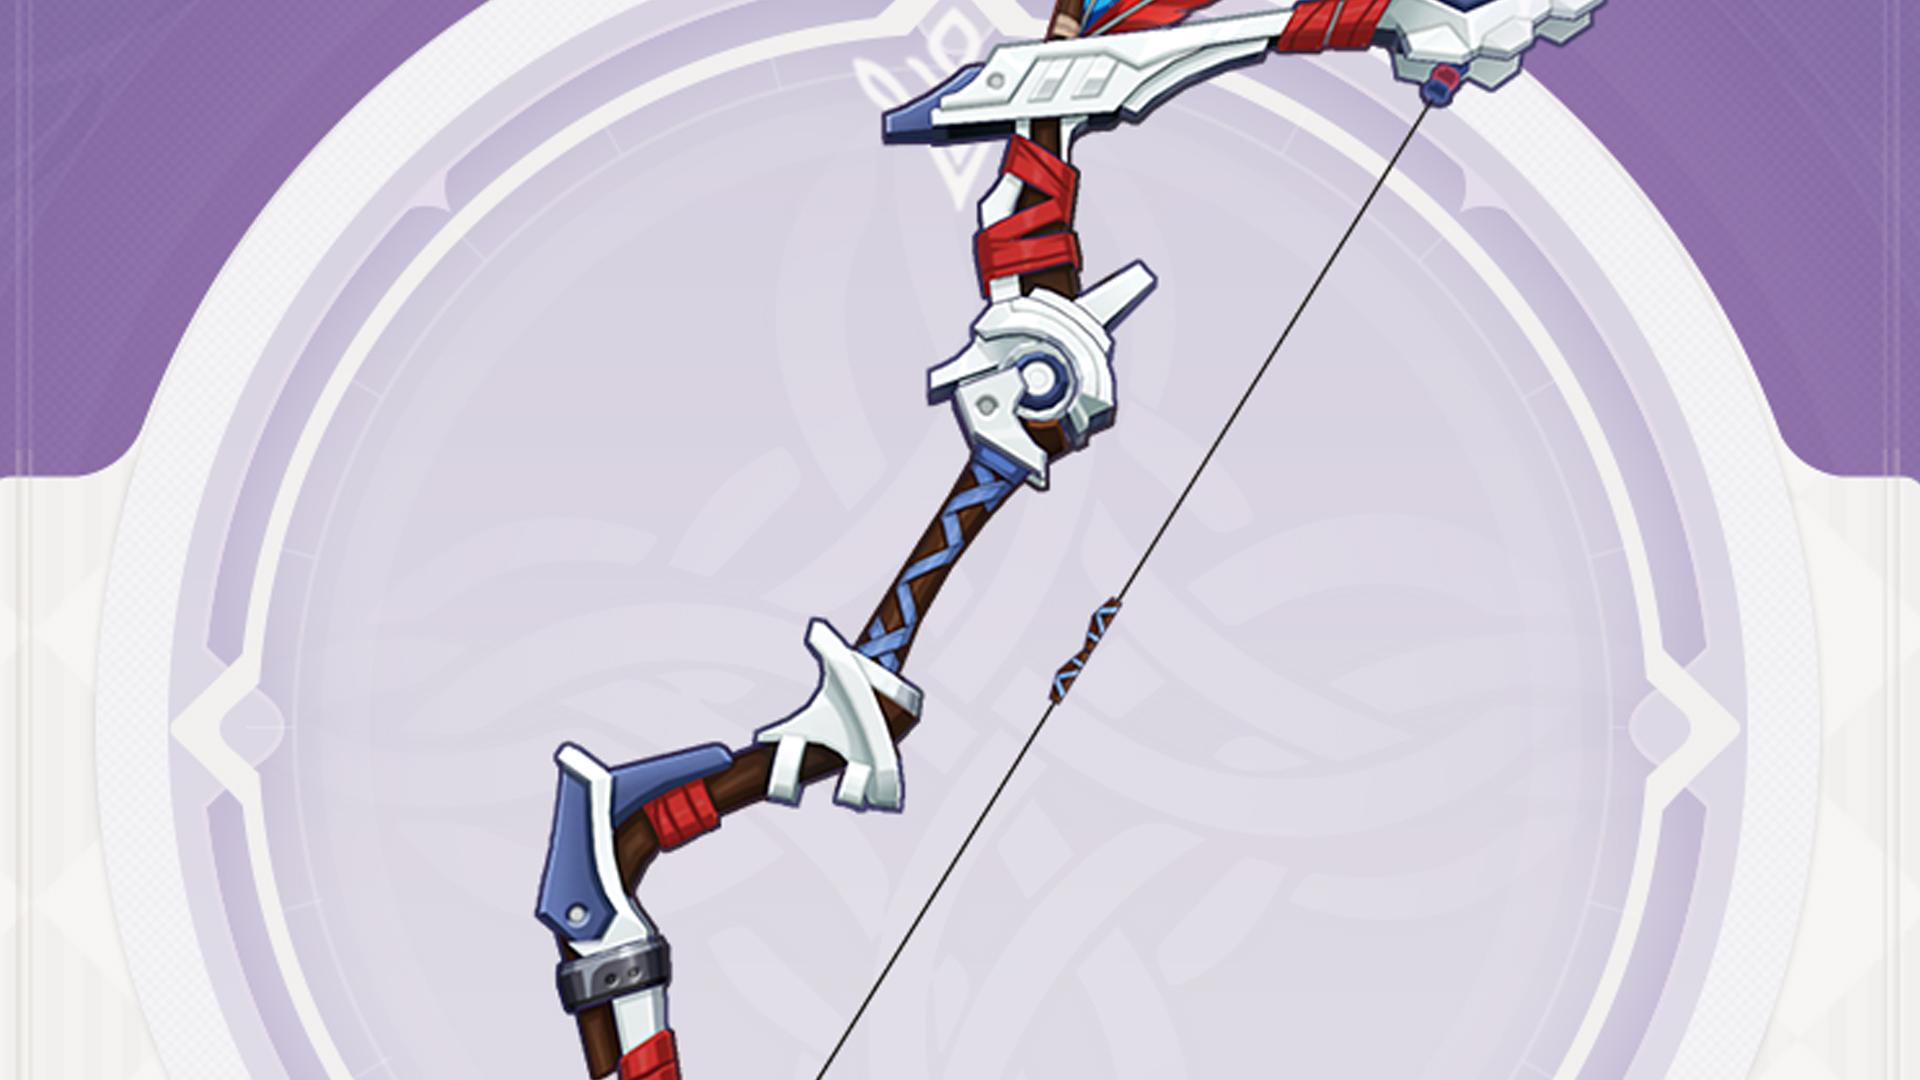 vignette-genshin-impact-arc-predateur